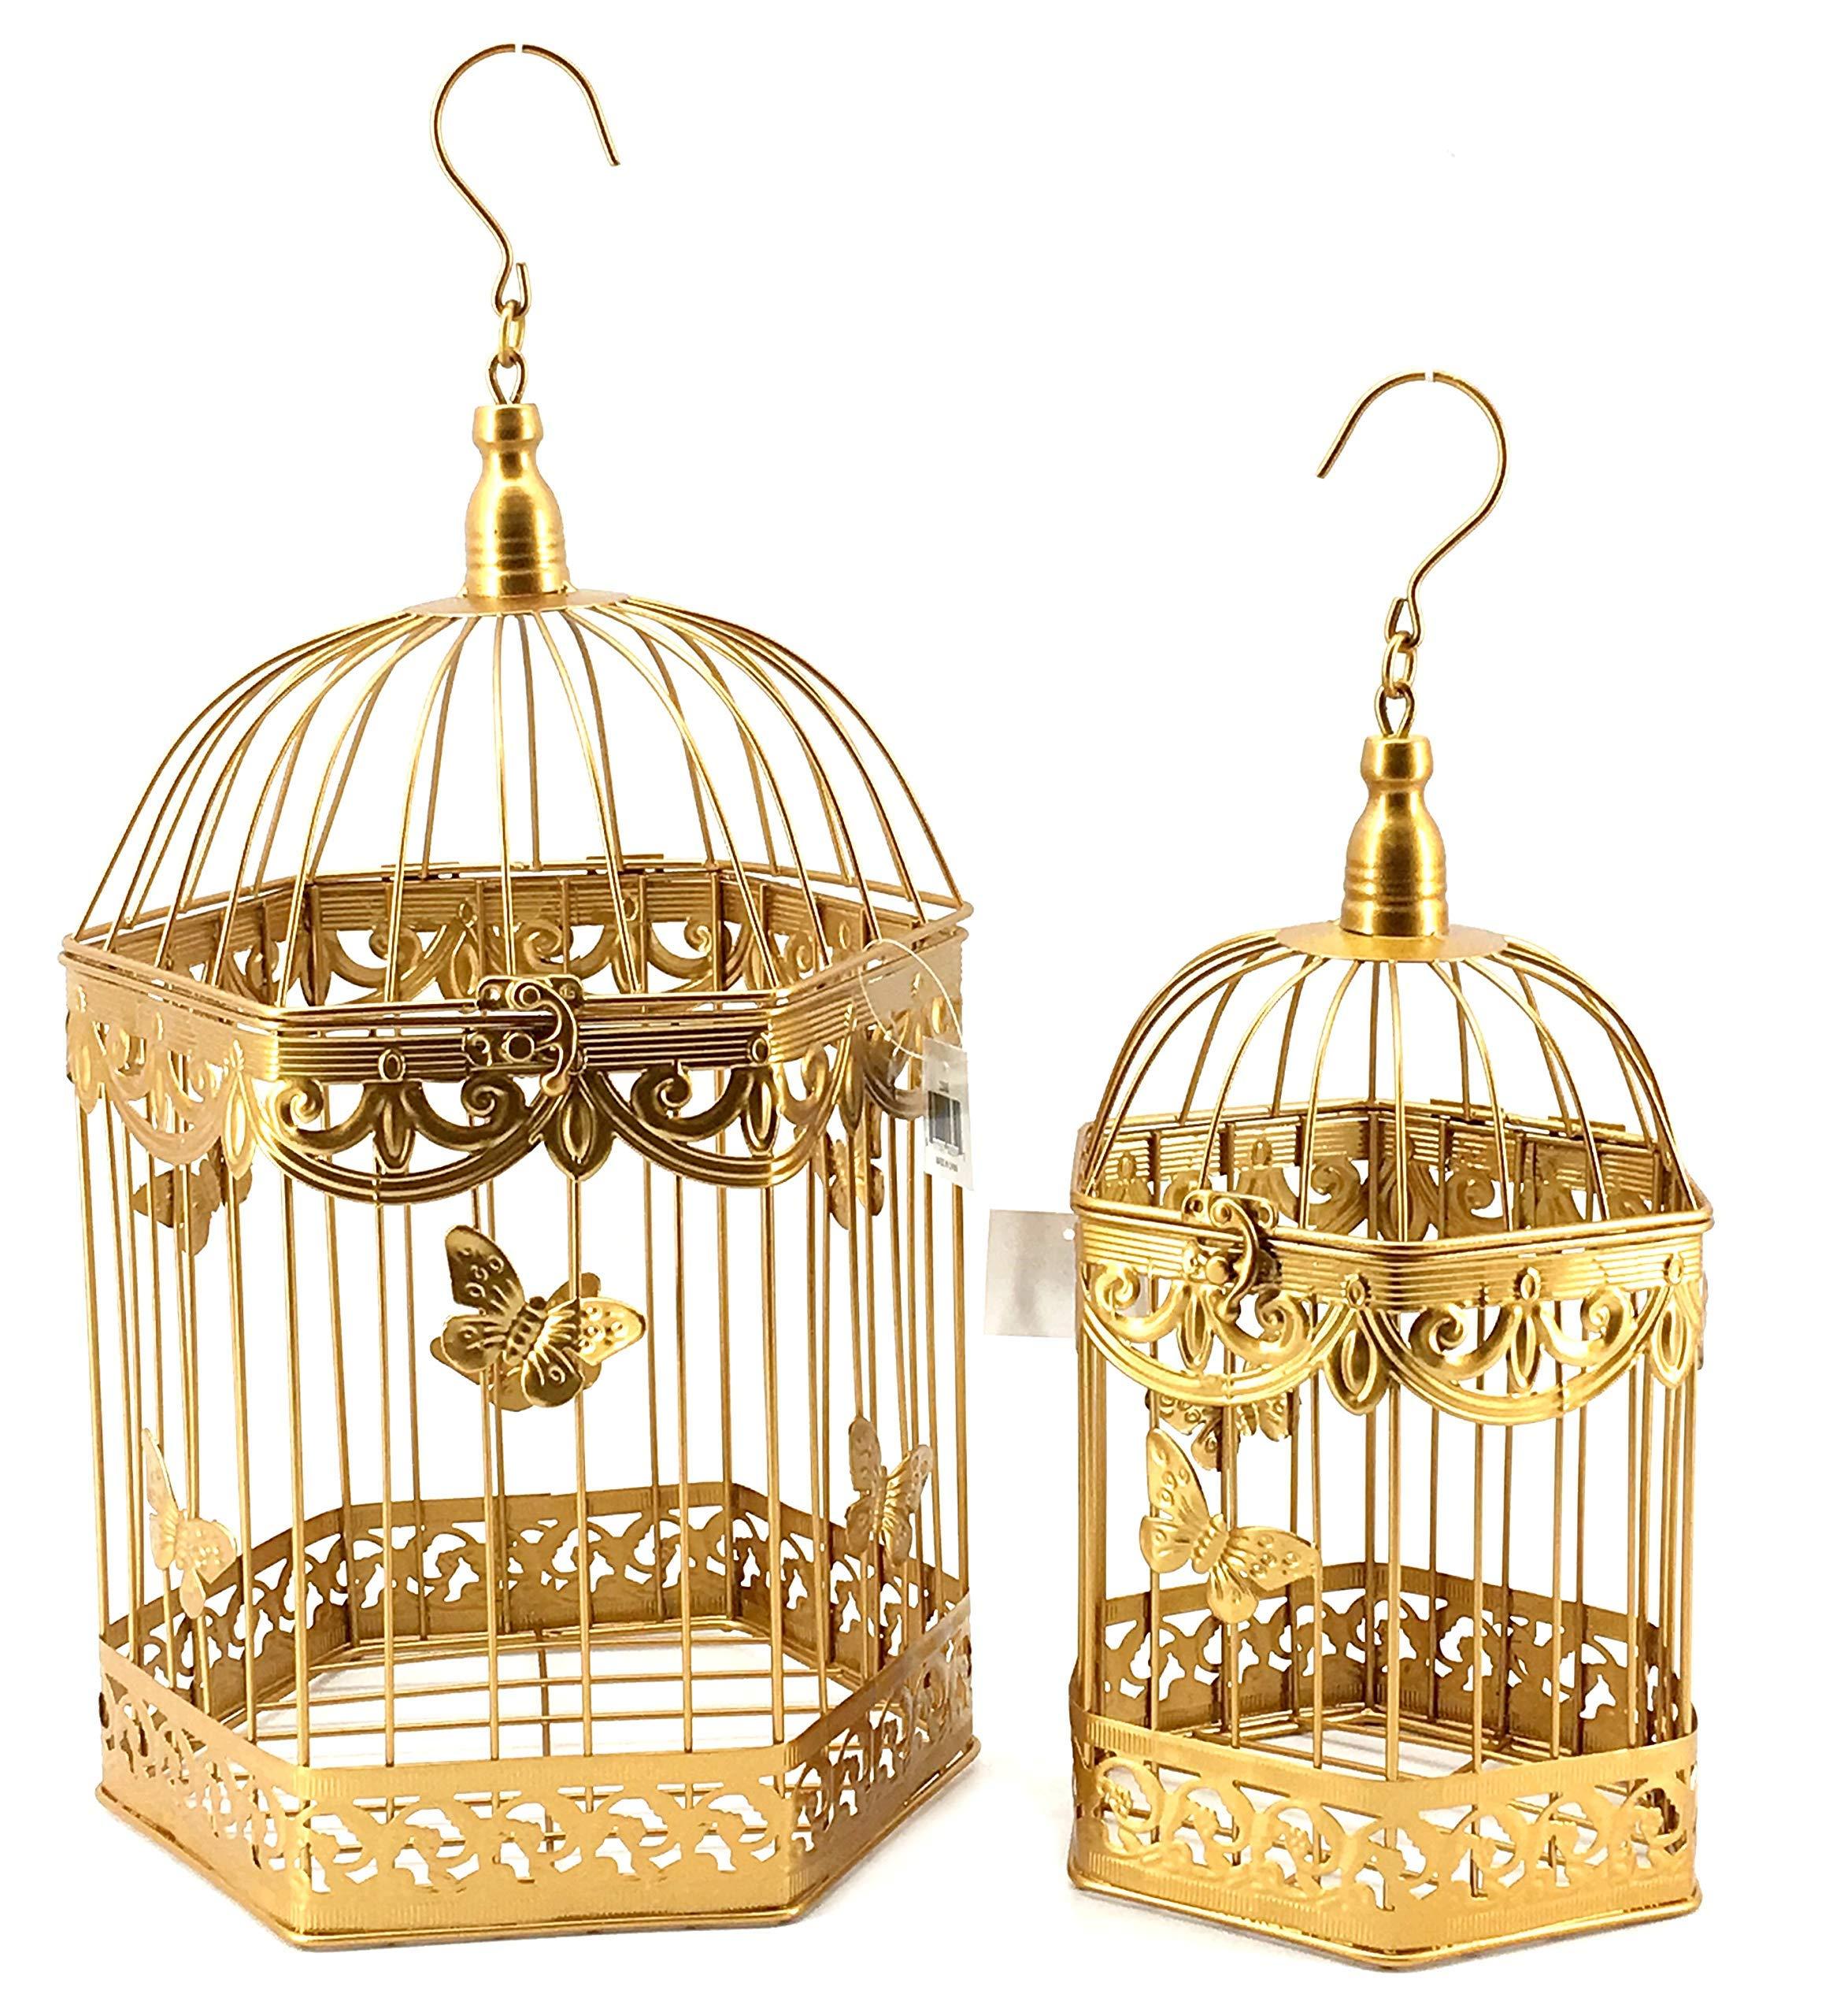 Bellaa 23592 Antique Vintage Bird Cages Metal 2Pcs 20 inch 16 inch Golden by Bellaa